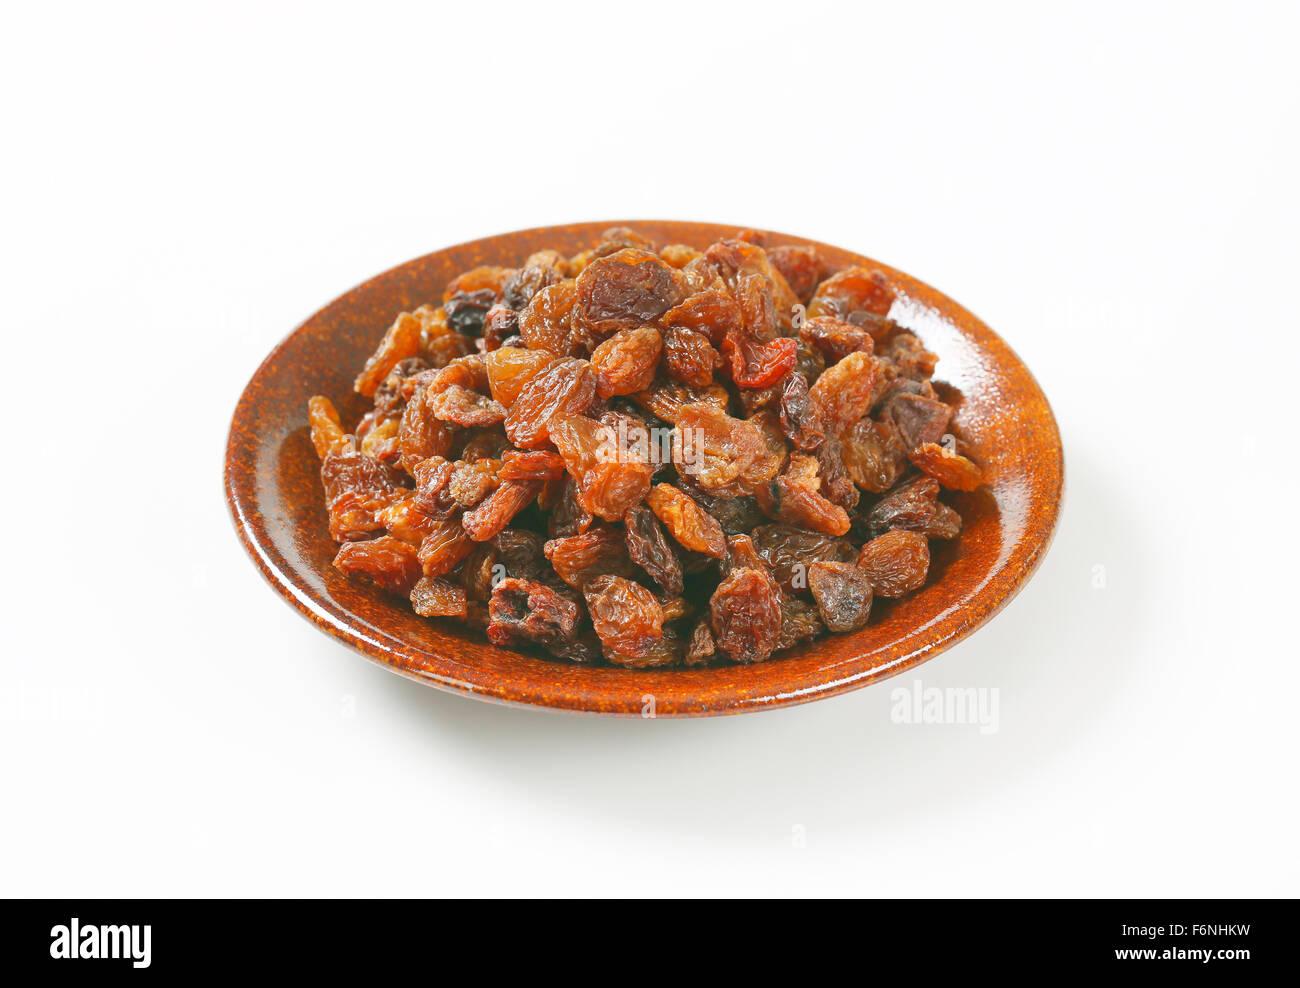 plate of raisins on white background - Stock Image